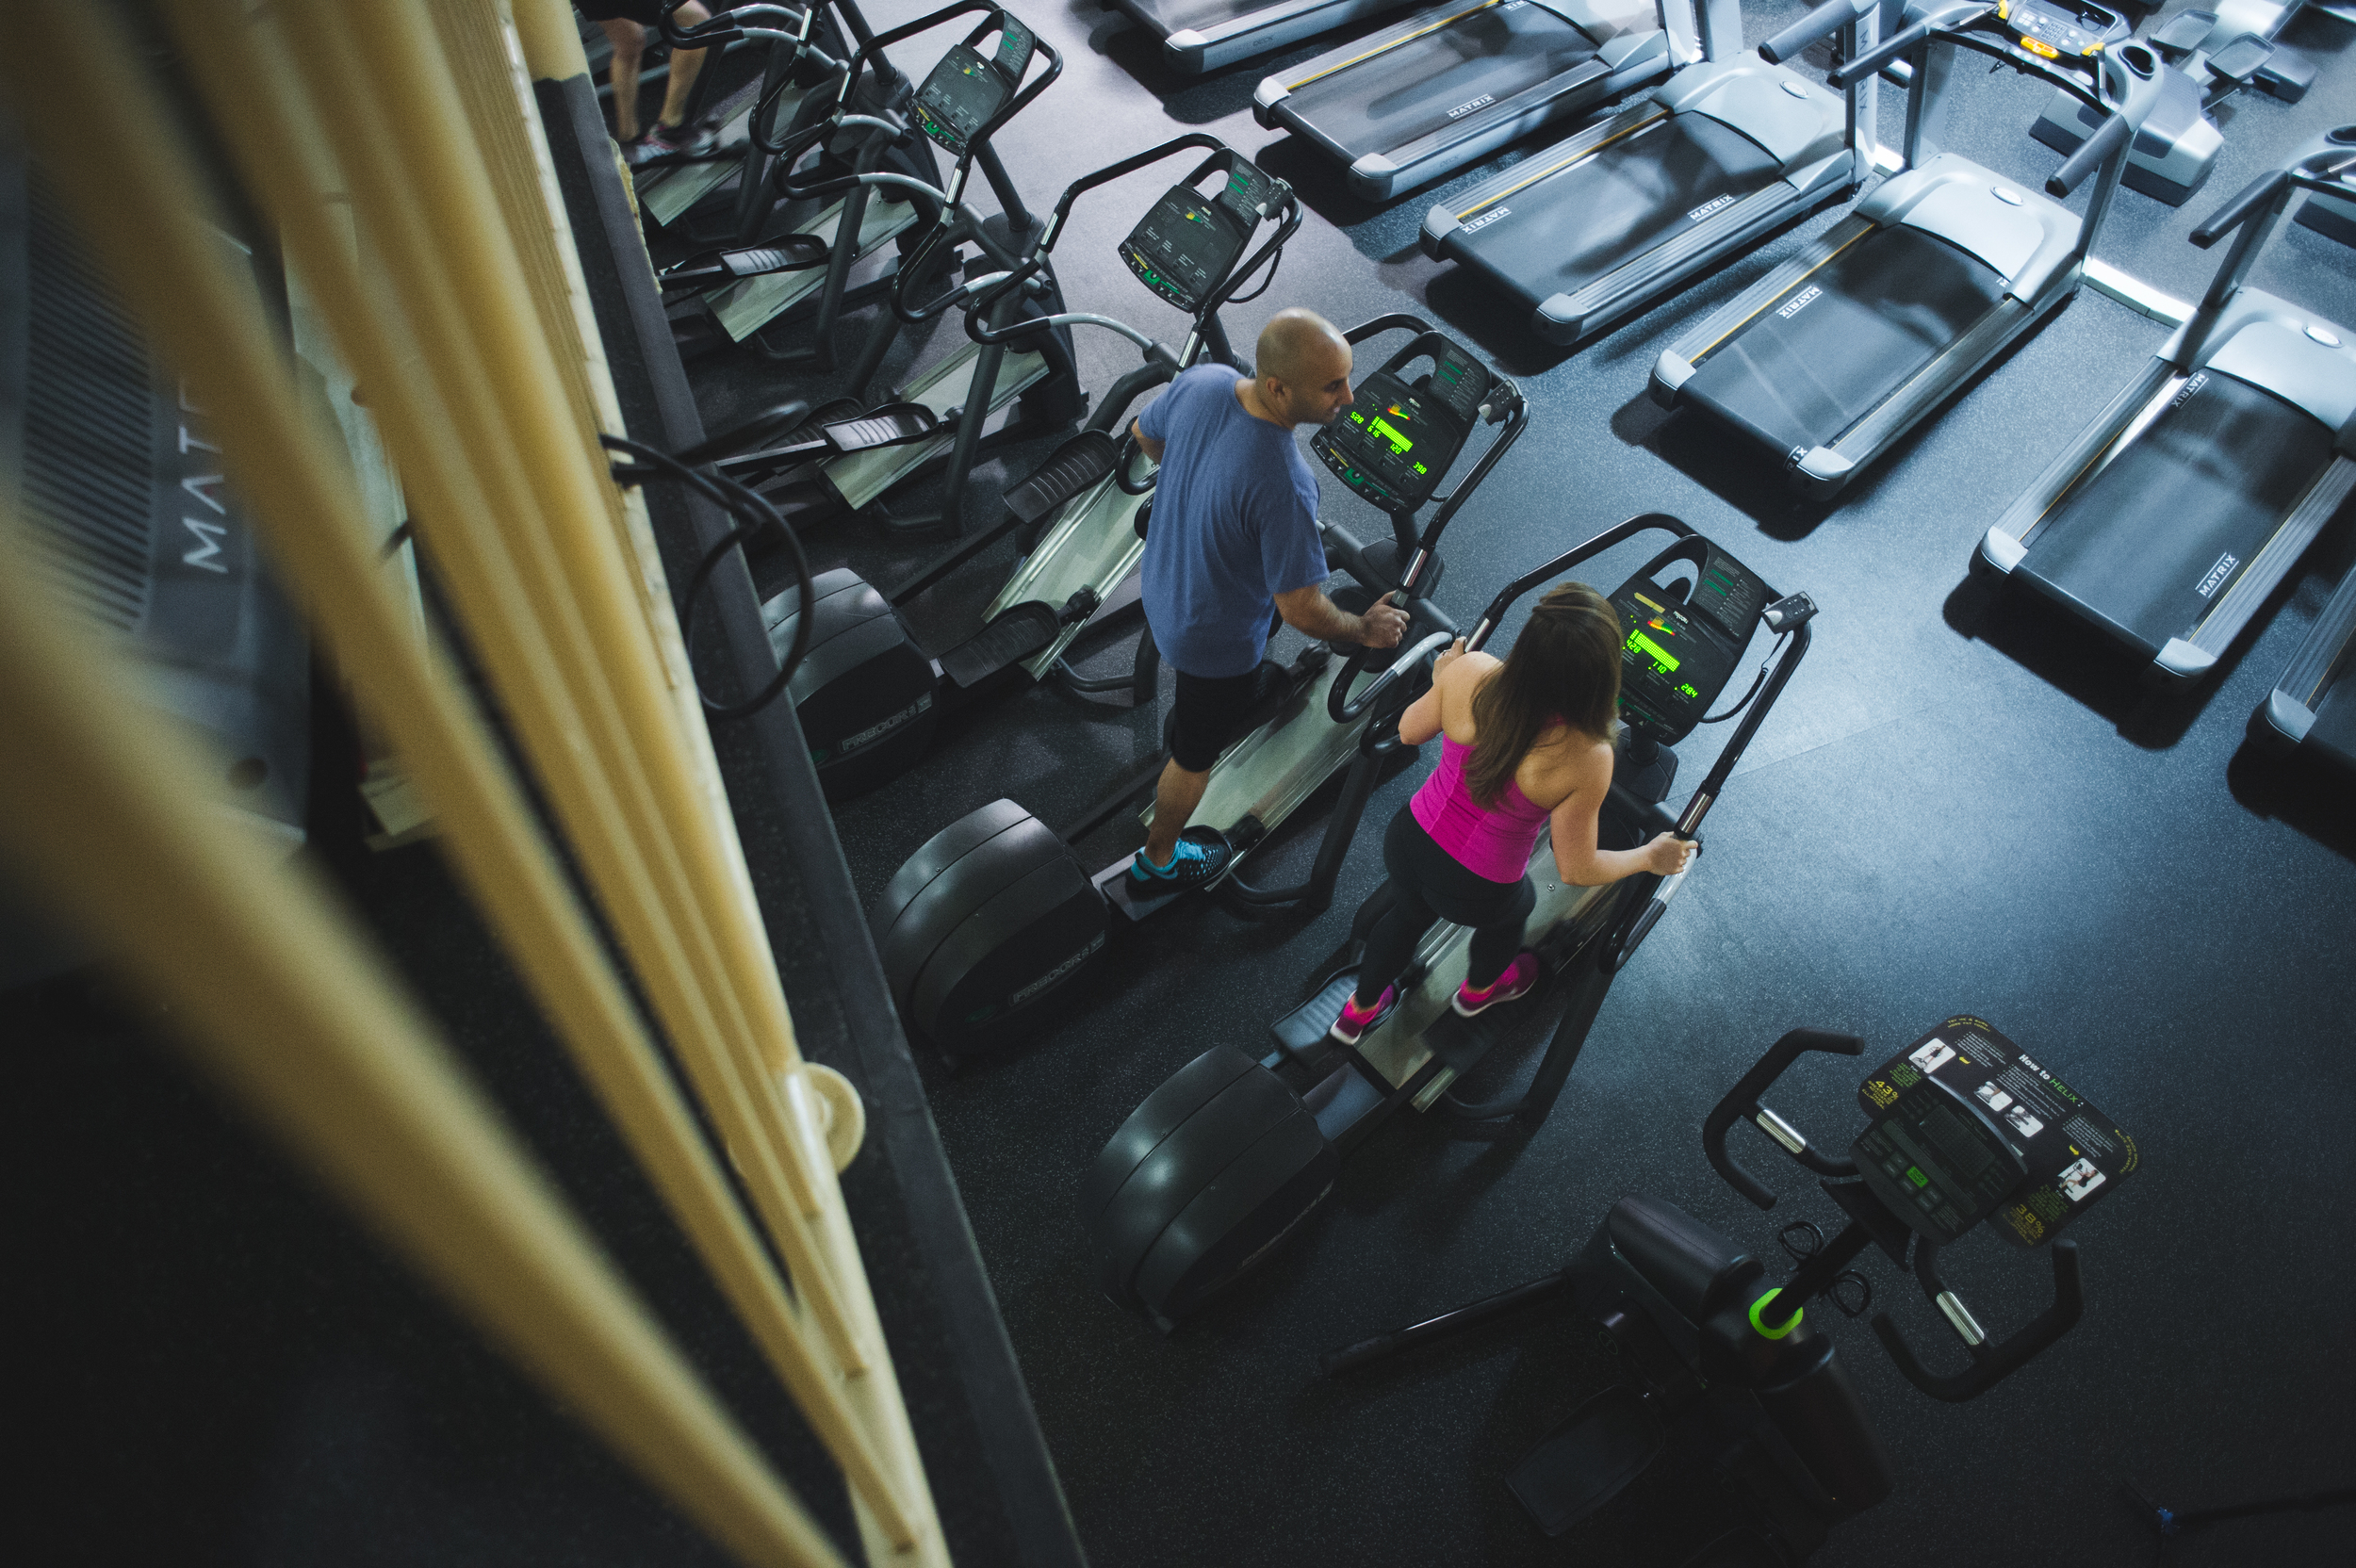 Gym Enagagement session by Mantas Kubilinskas-2.jpg